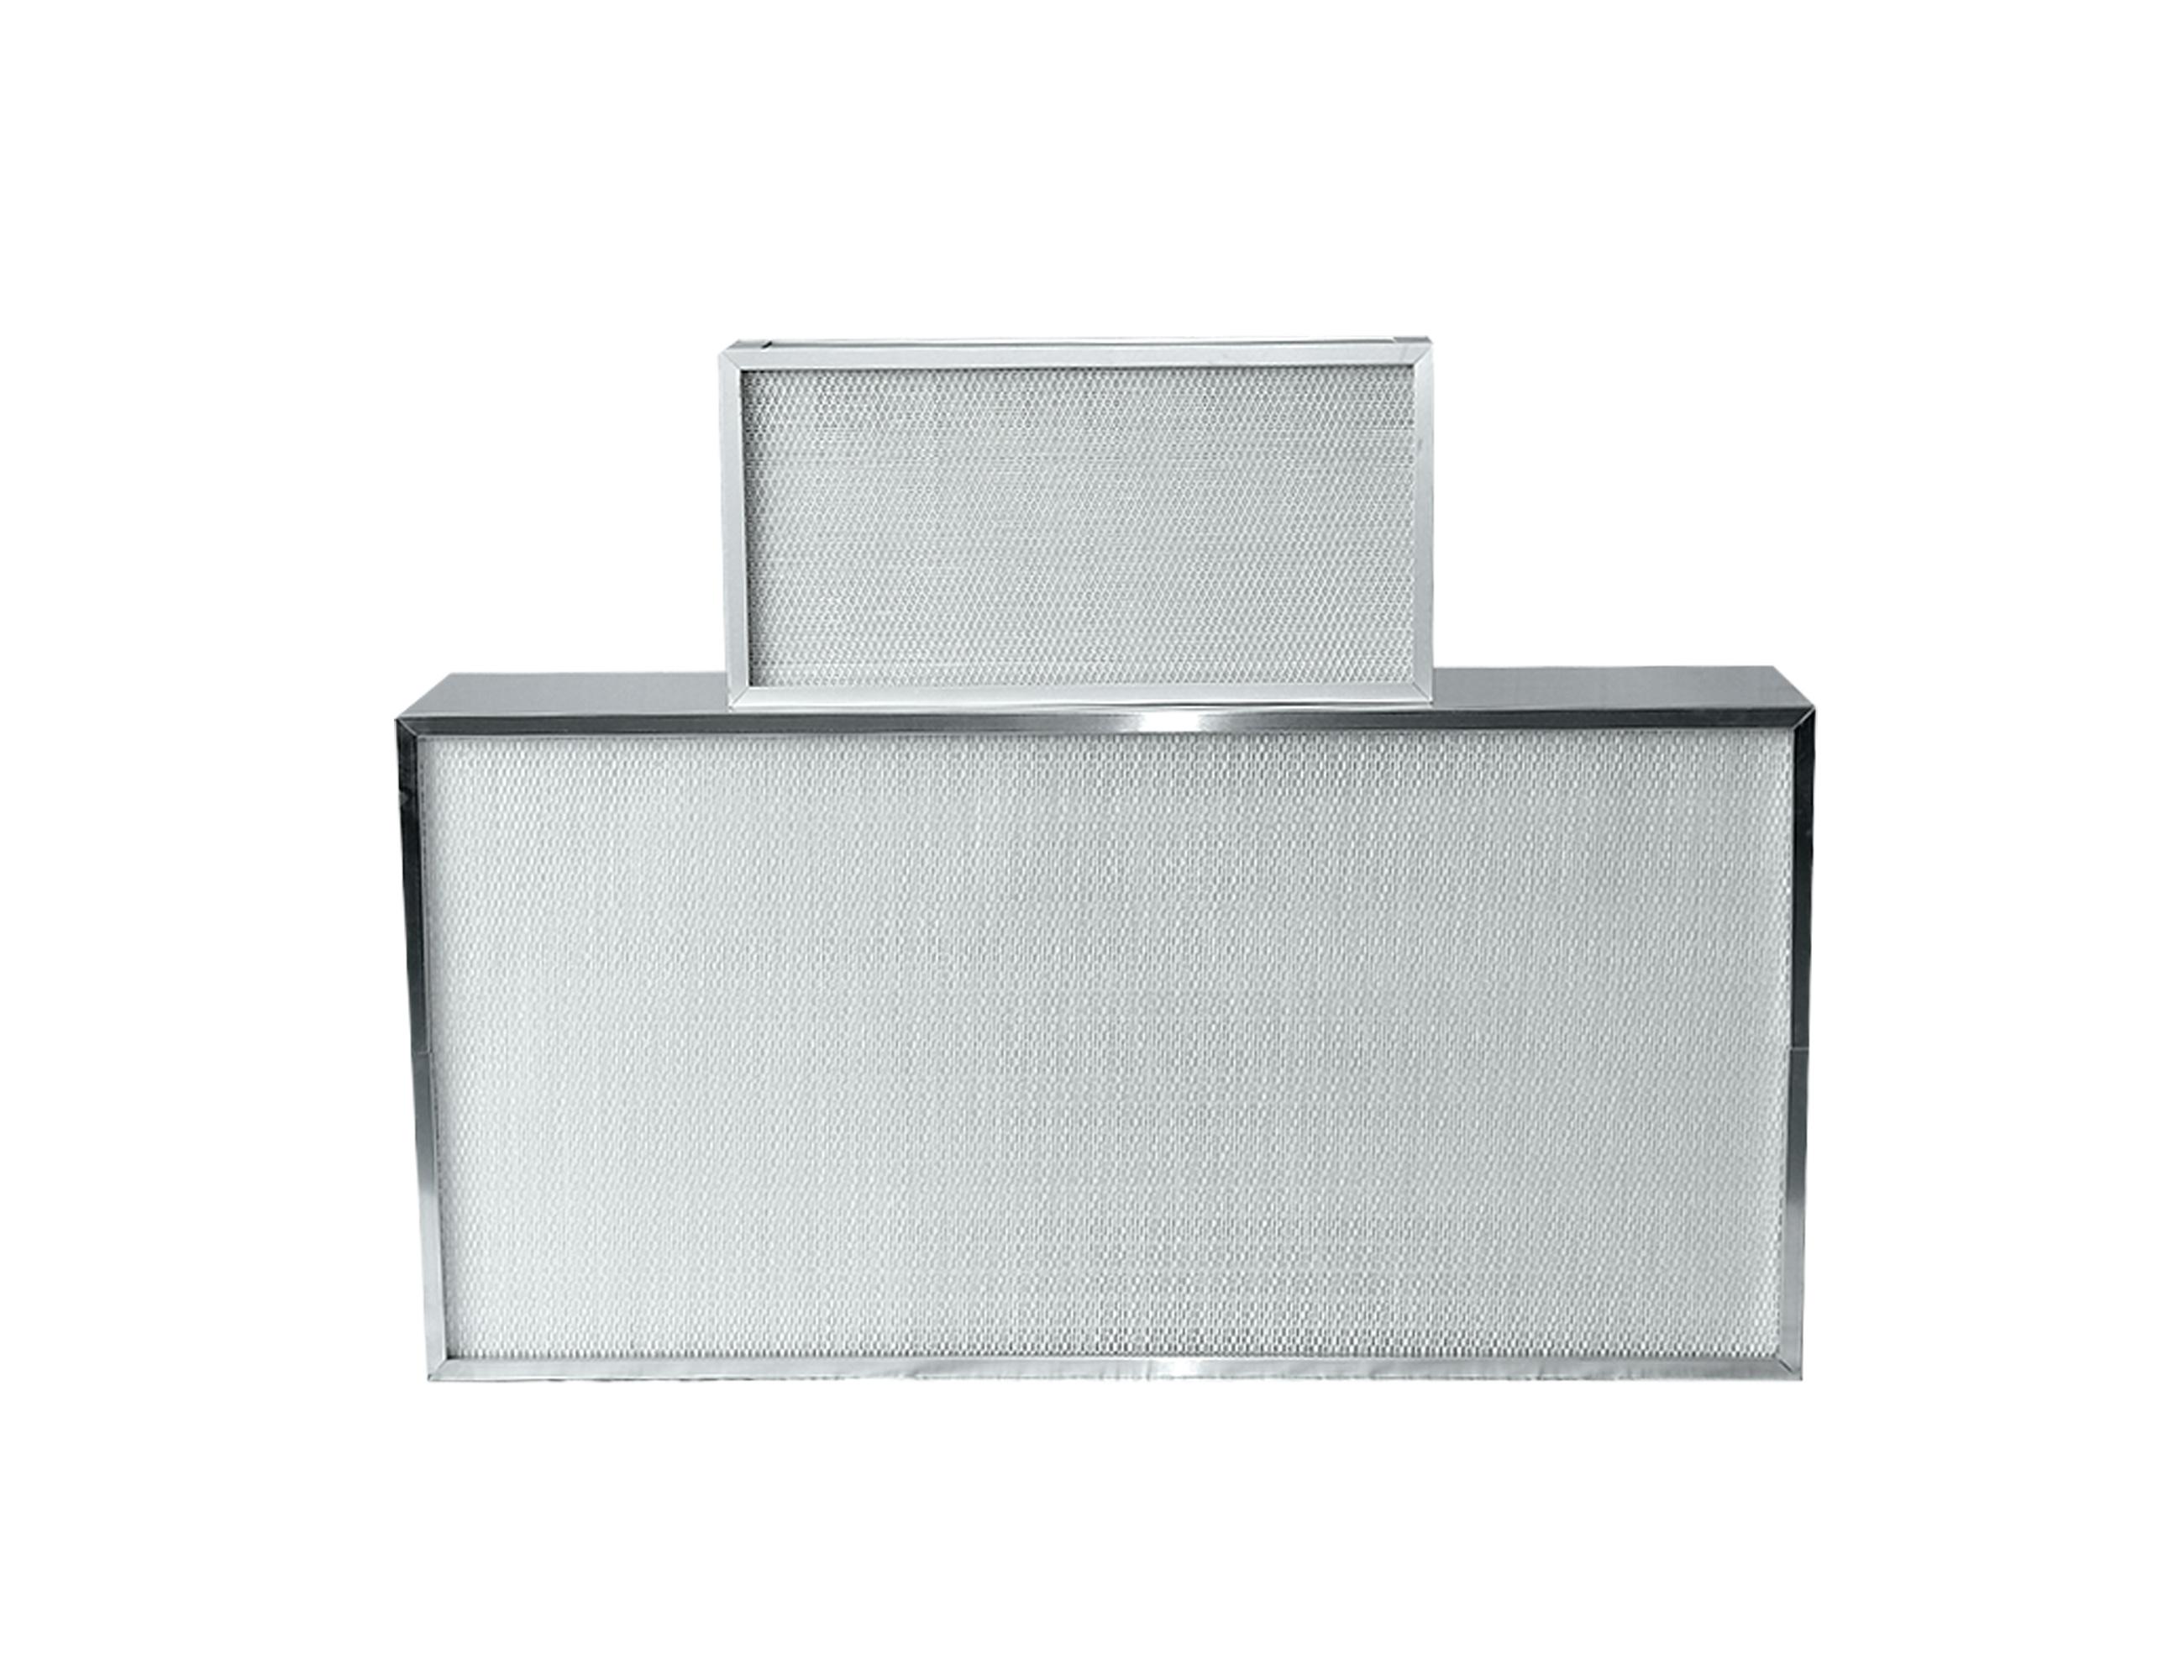 High temperature resistant mini pleated HEPA filter